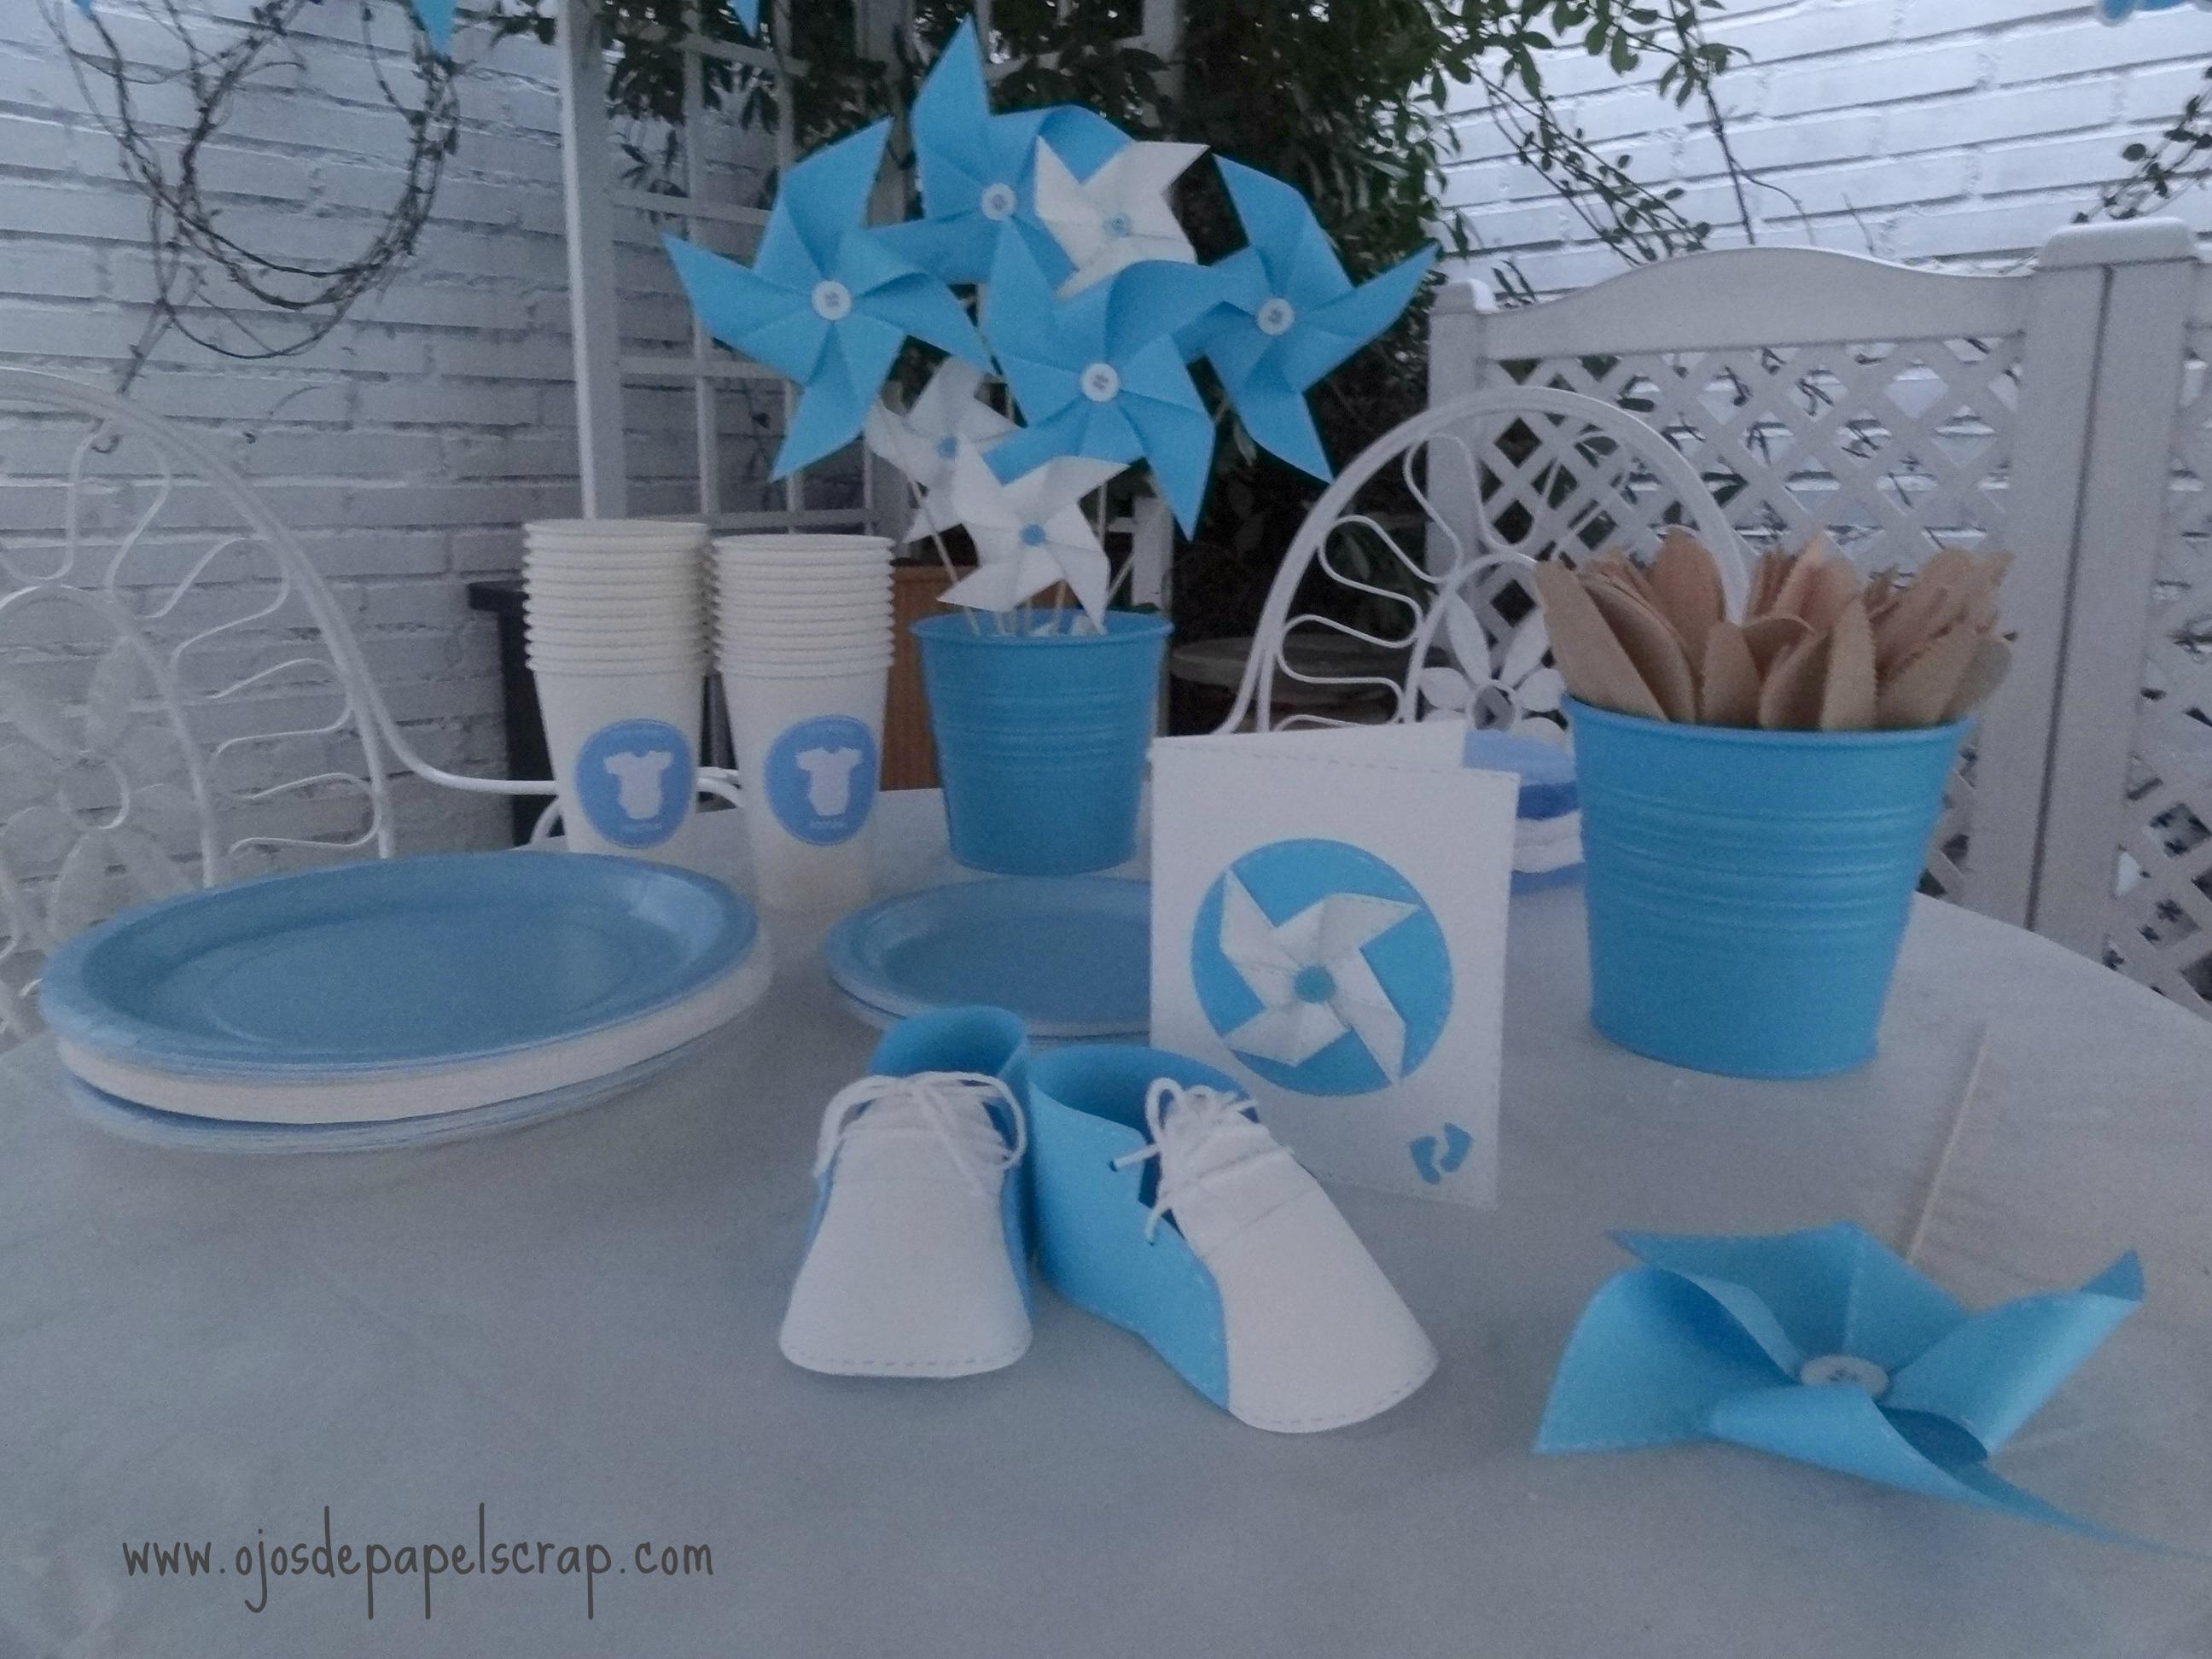 Decoraci³n babyshower azul